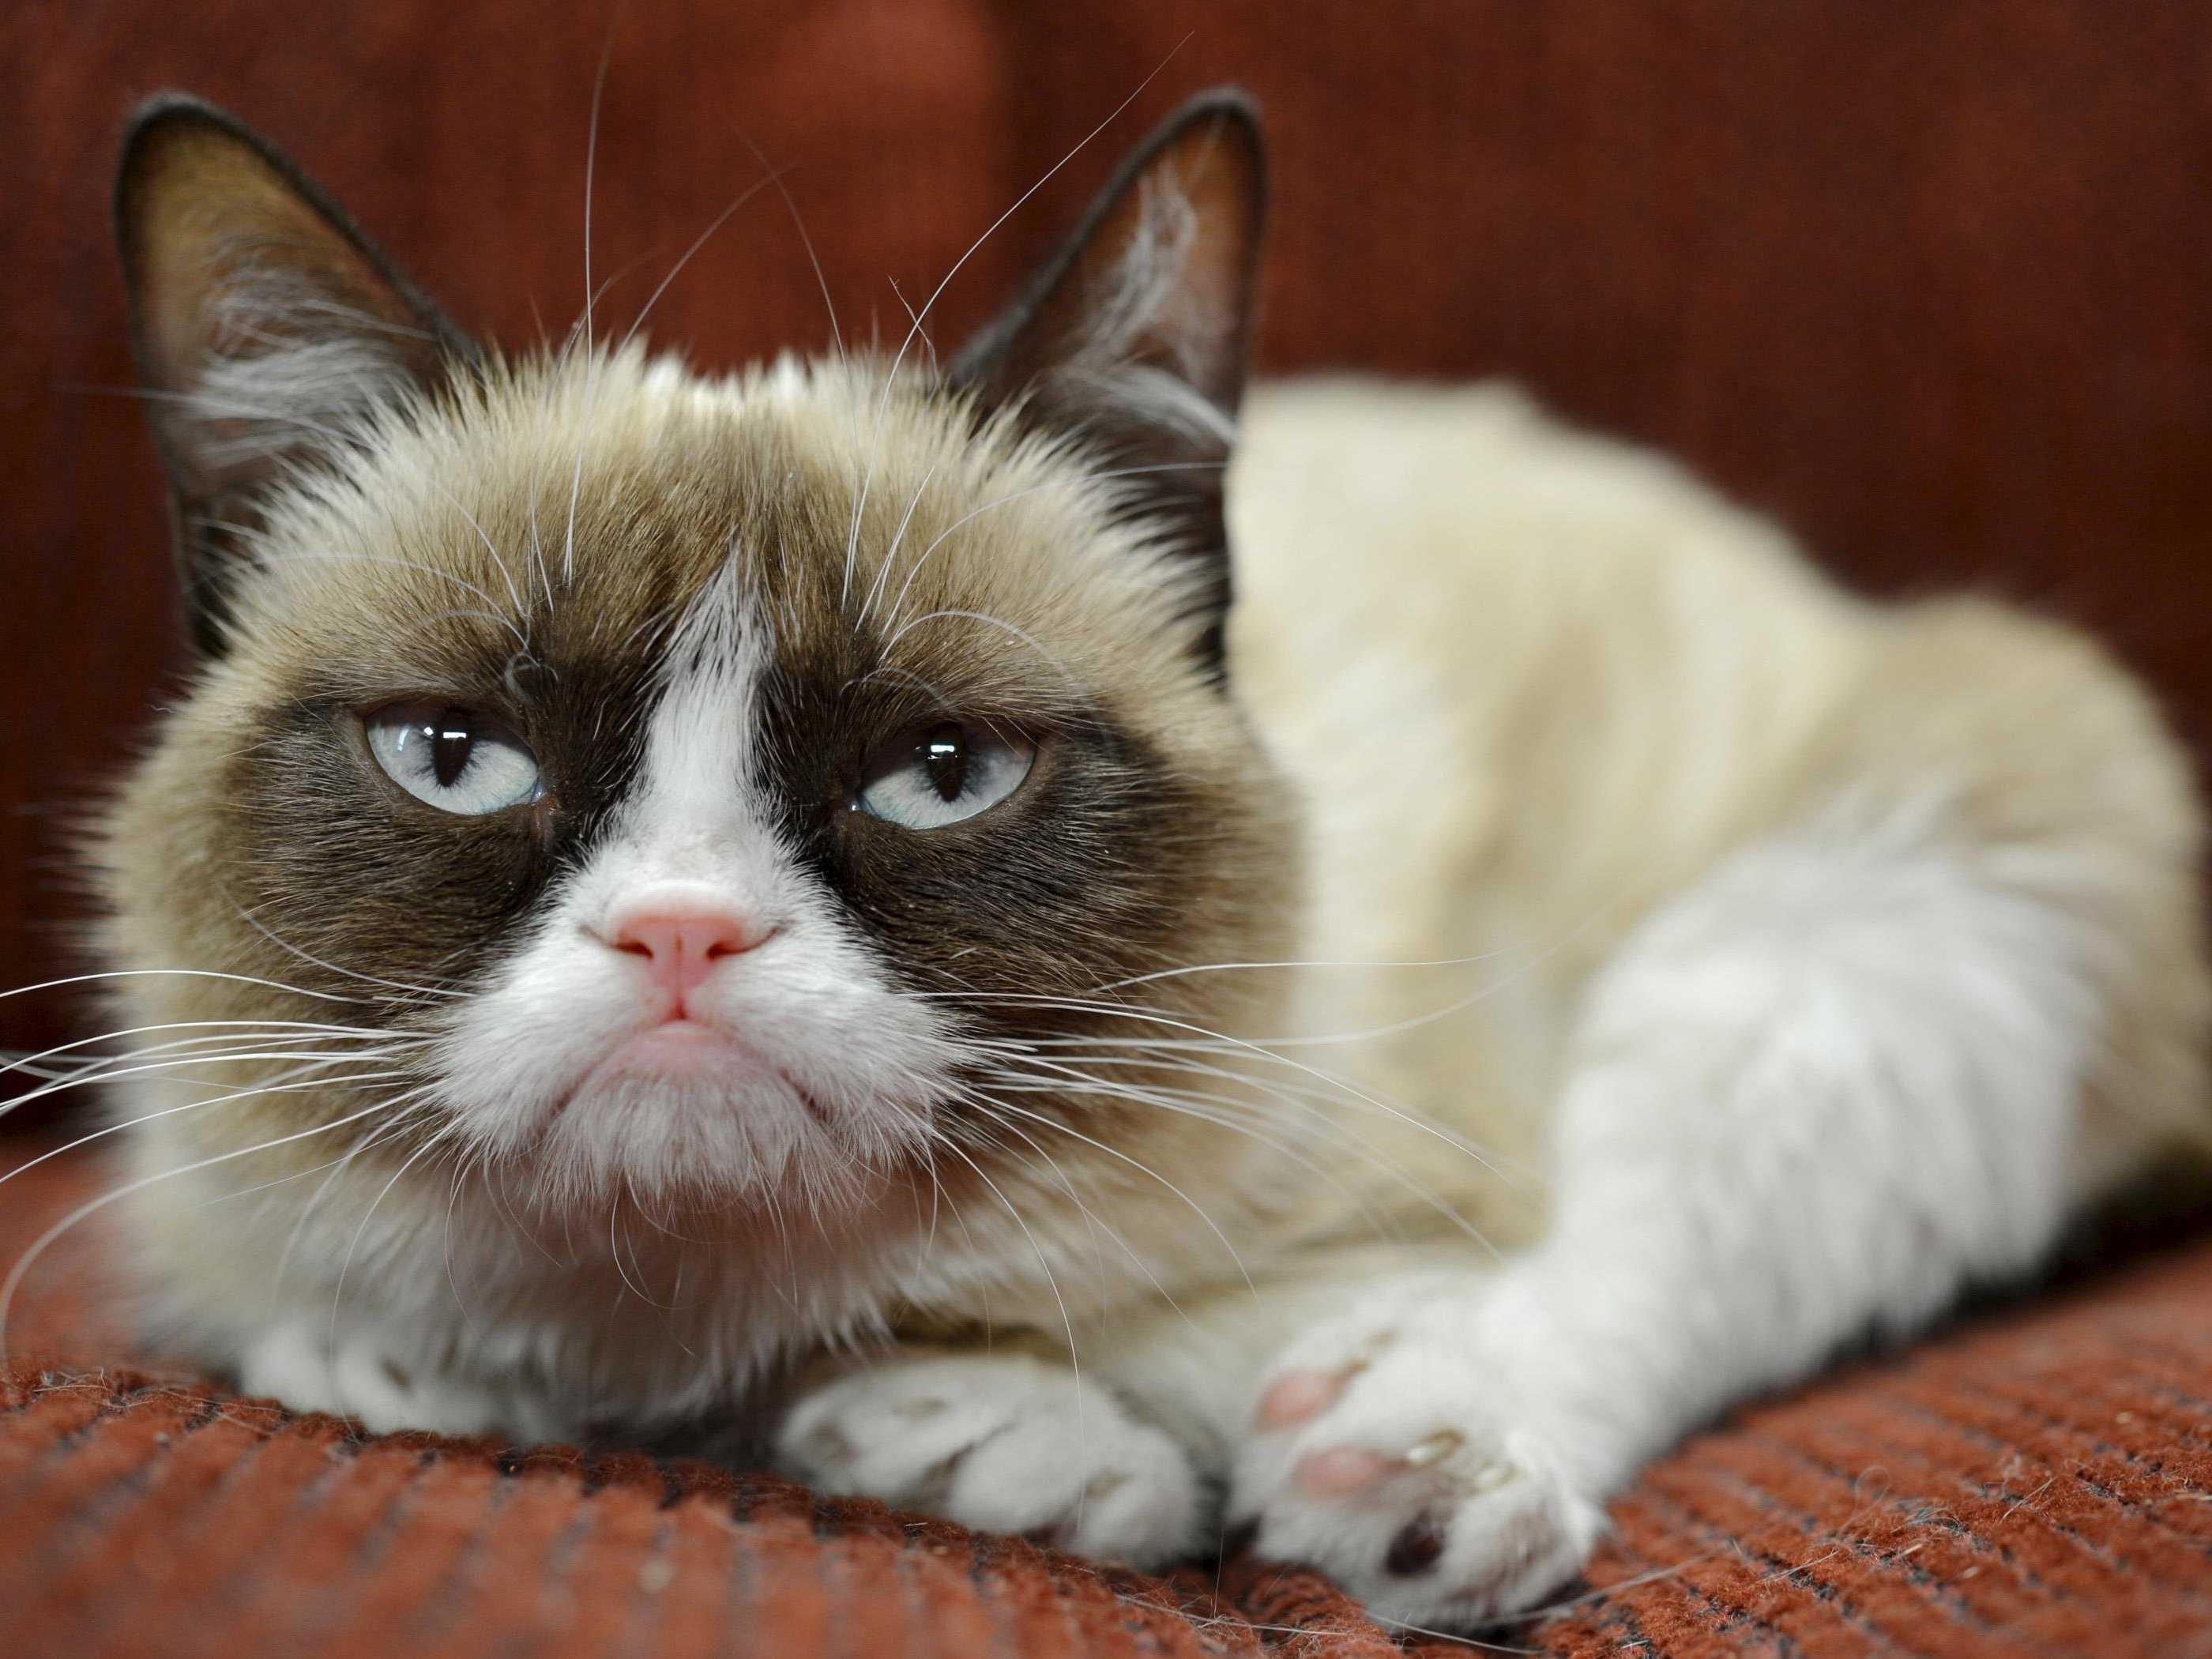 grumpy cat wallpaper iphone 4 great web wallpaper g251wsqi 2800x2100